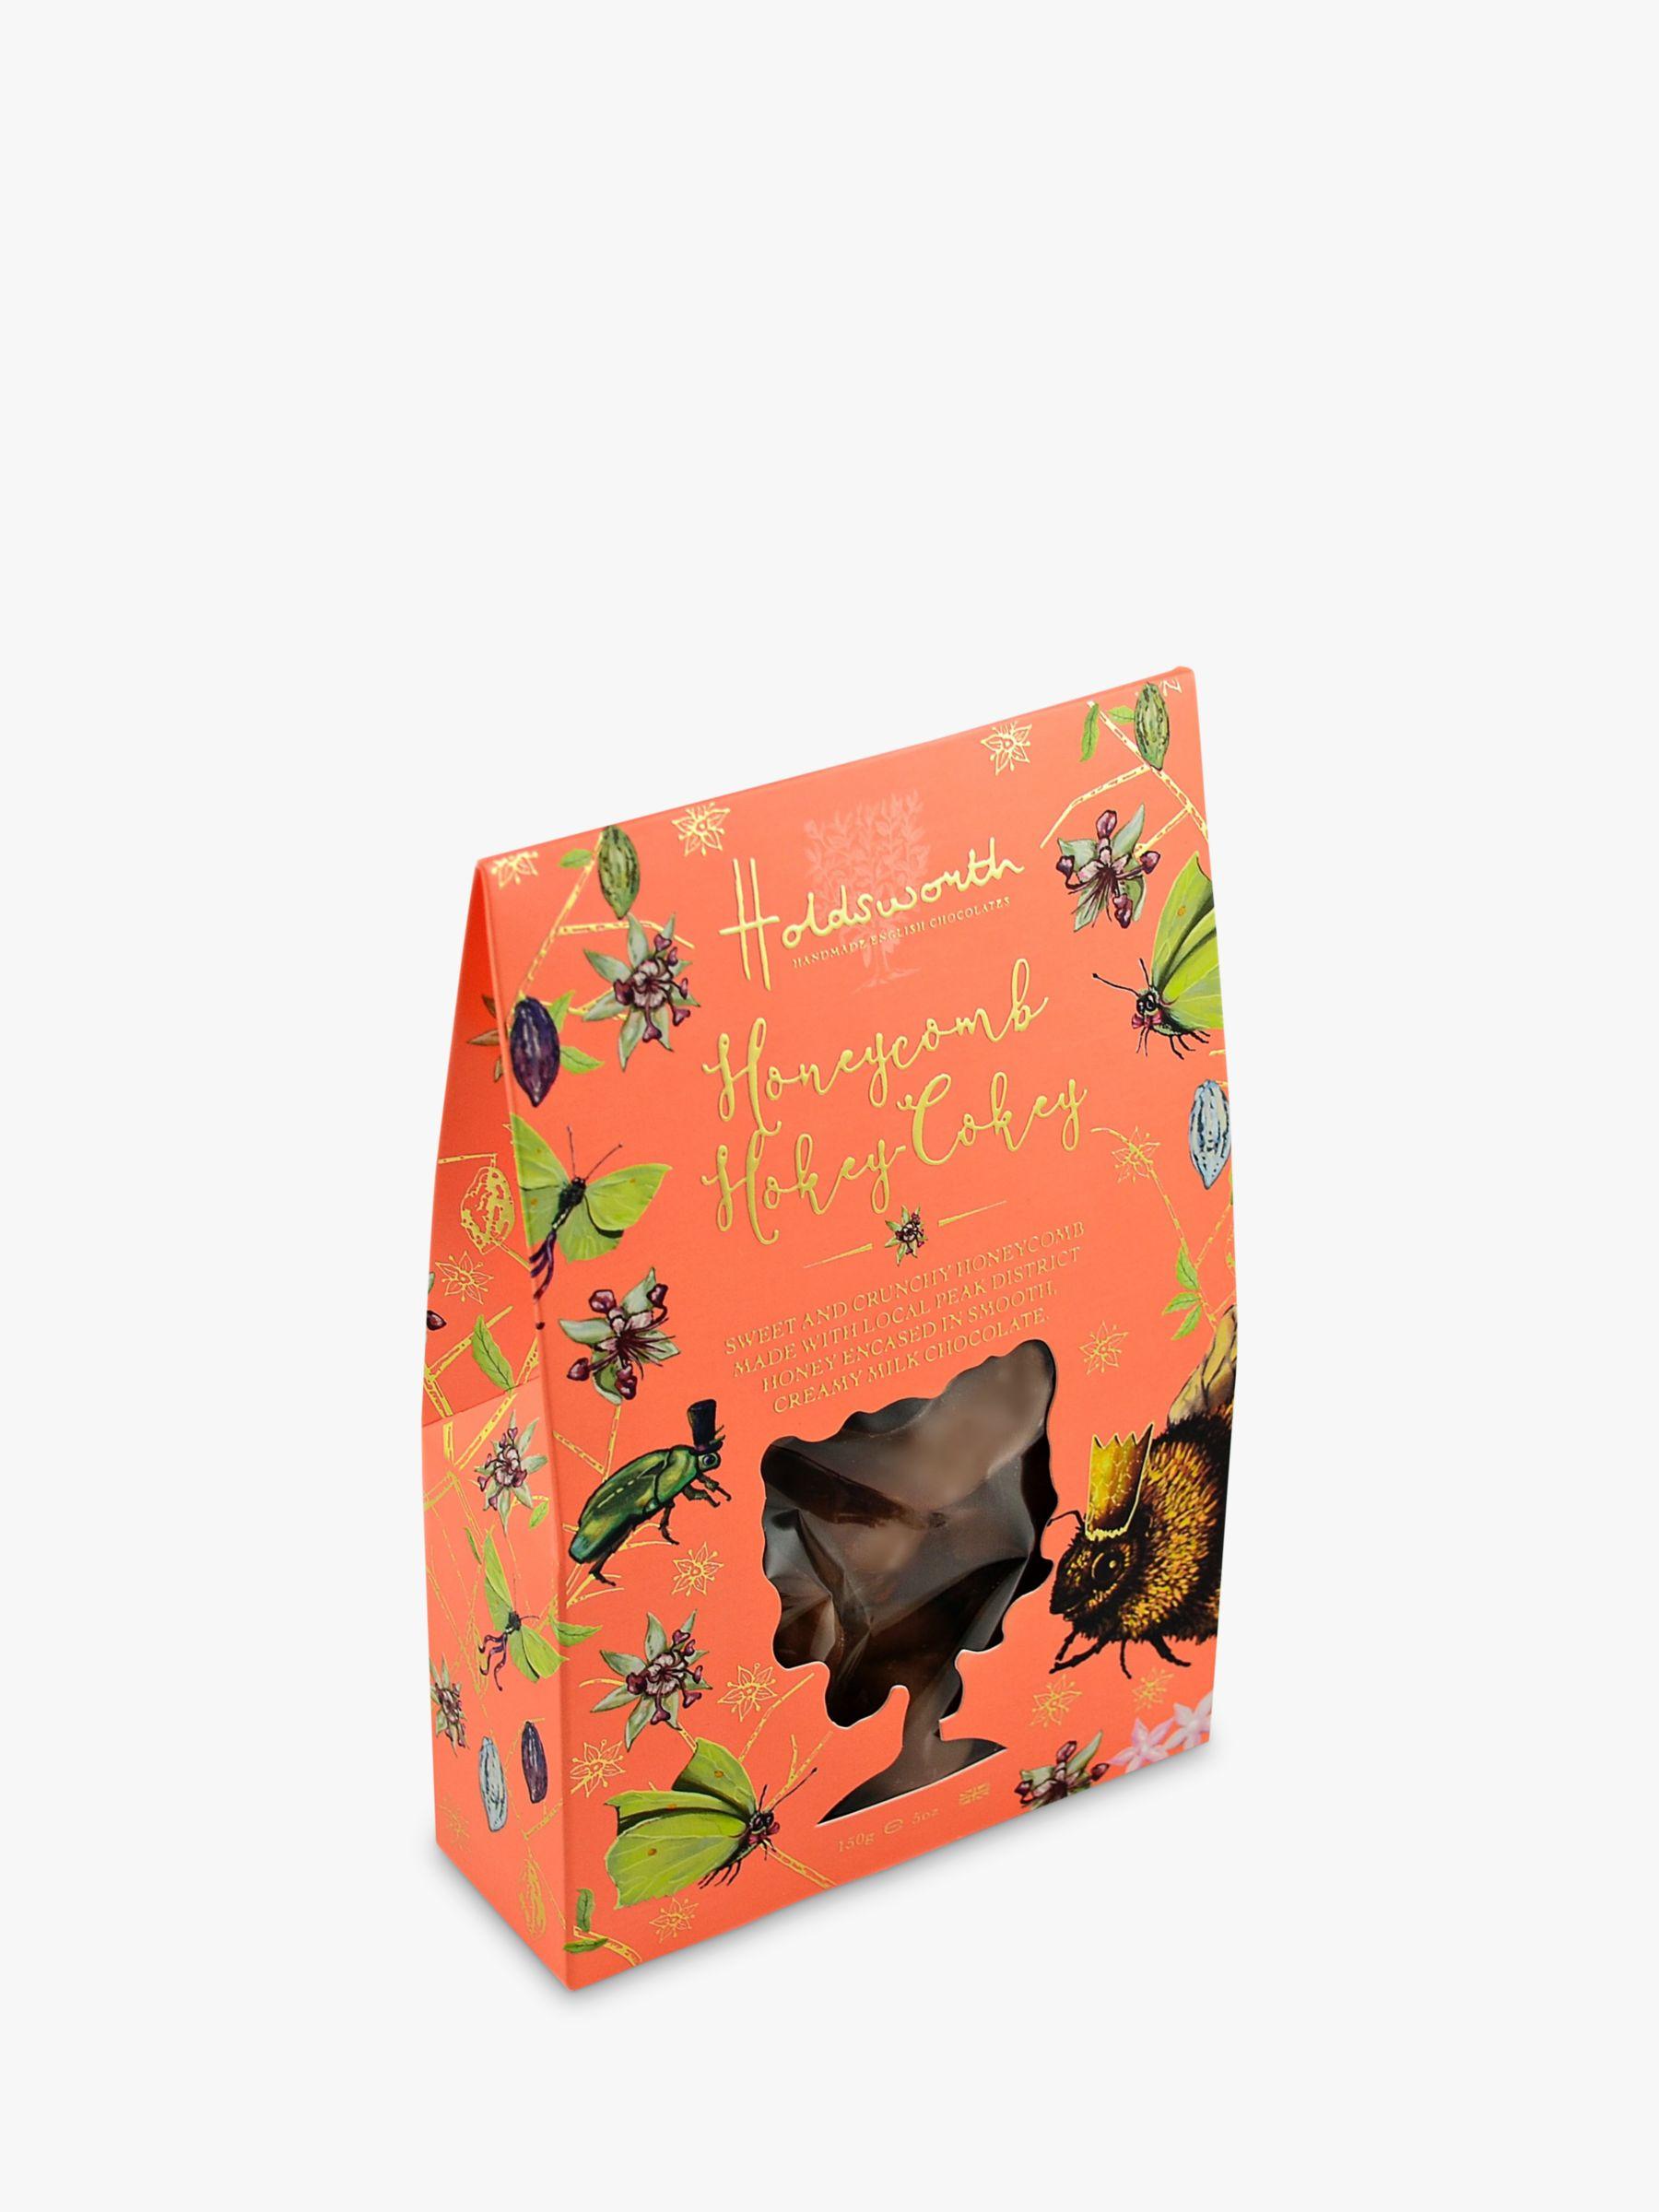 Holdsworth Holdsworth Honeycomb Hokey Cokey, 150g